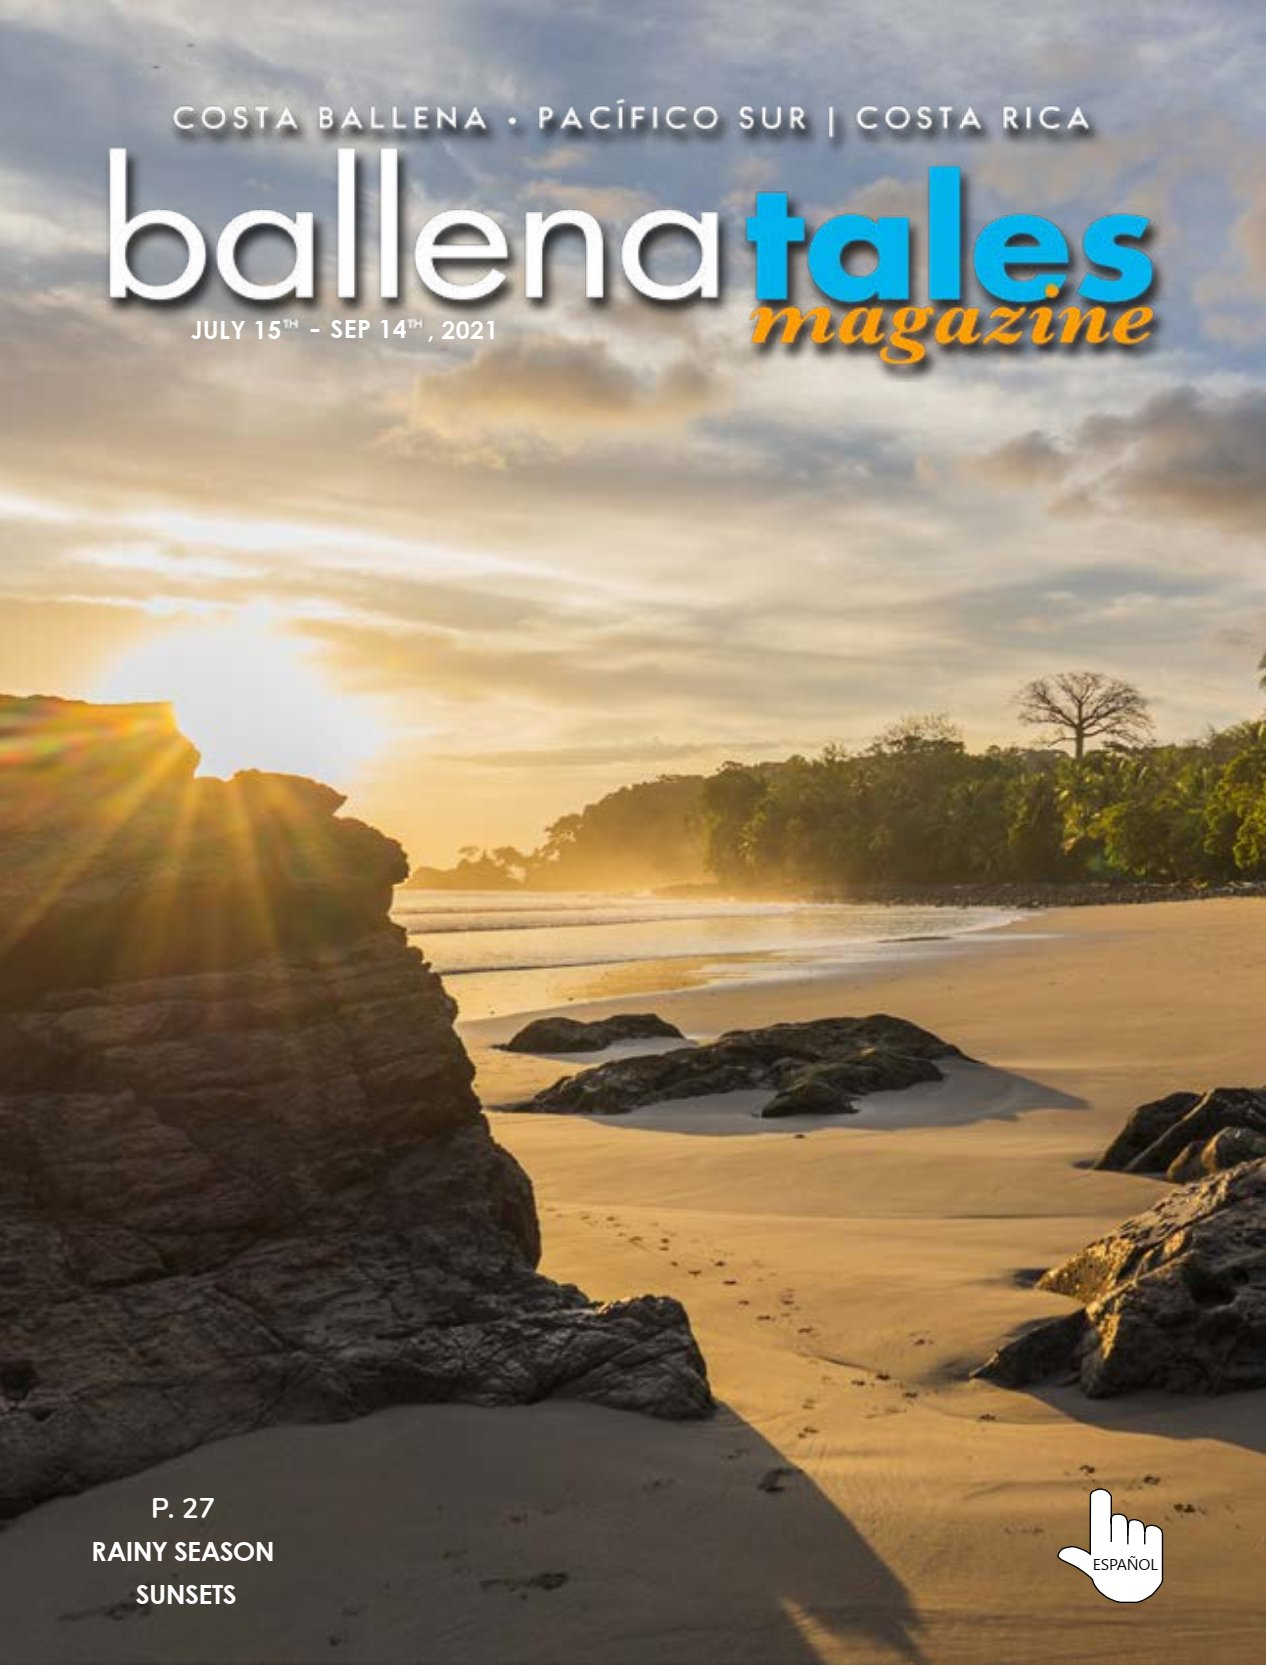 Revista Ballena Tales 79, guía para viajeros, residentes e inversionistas